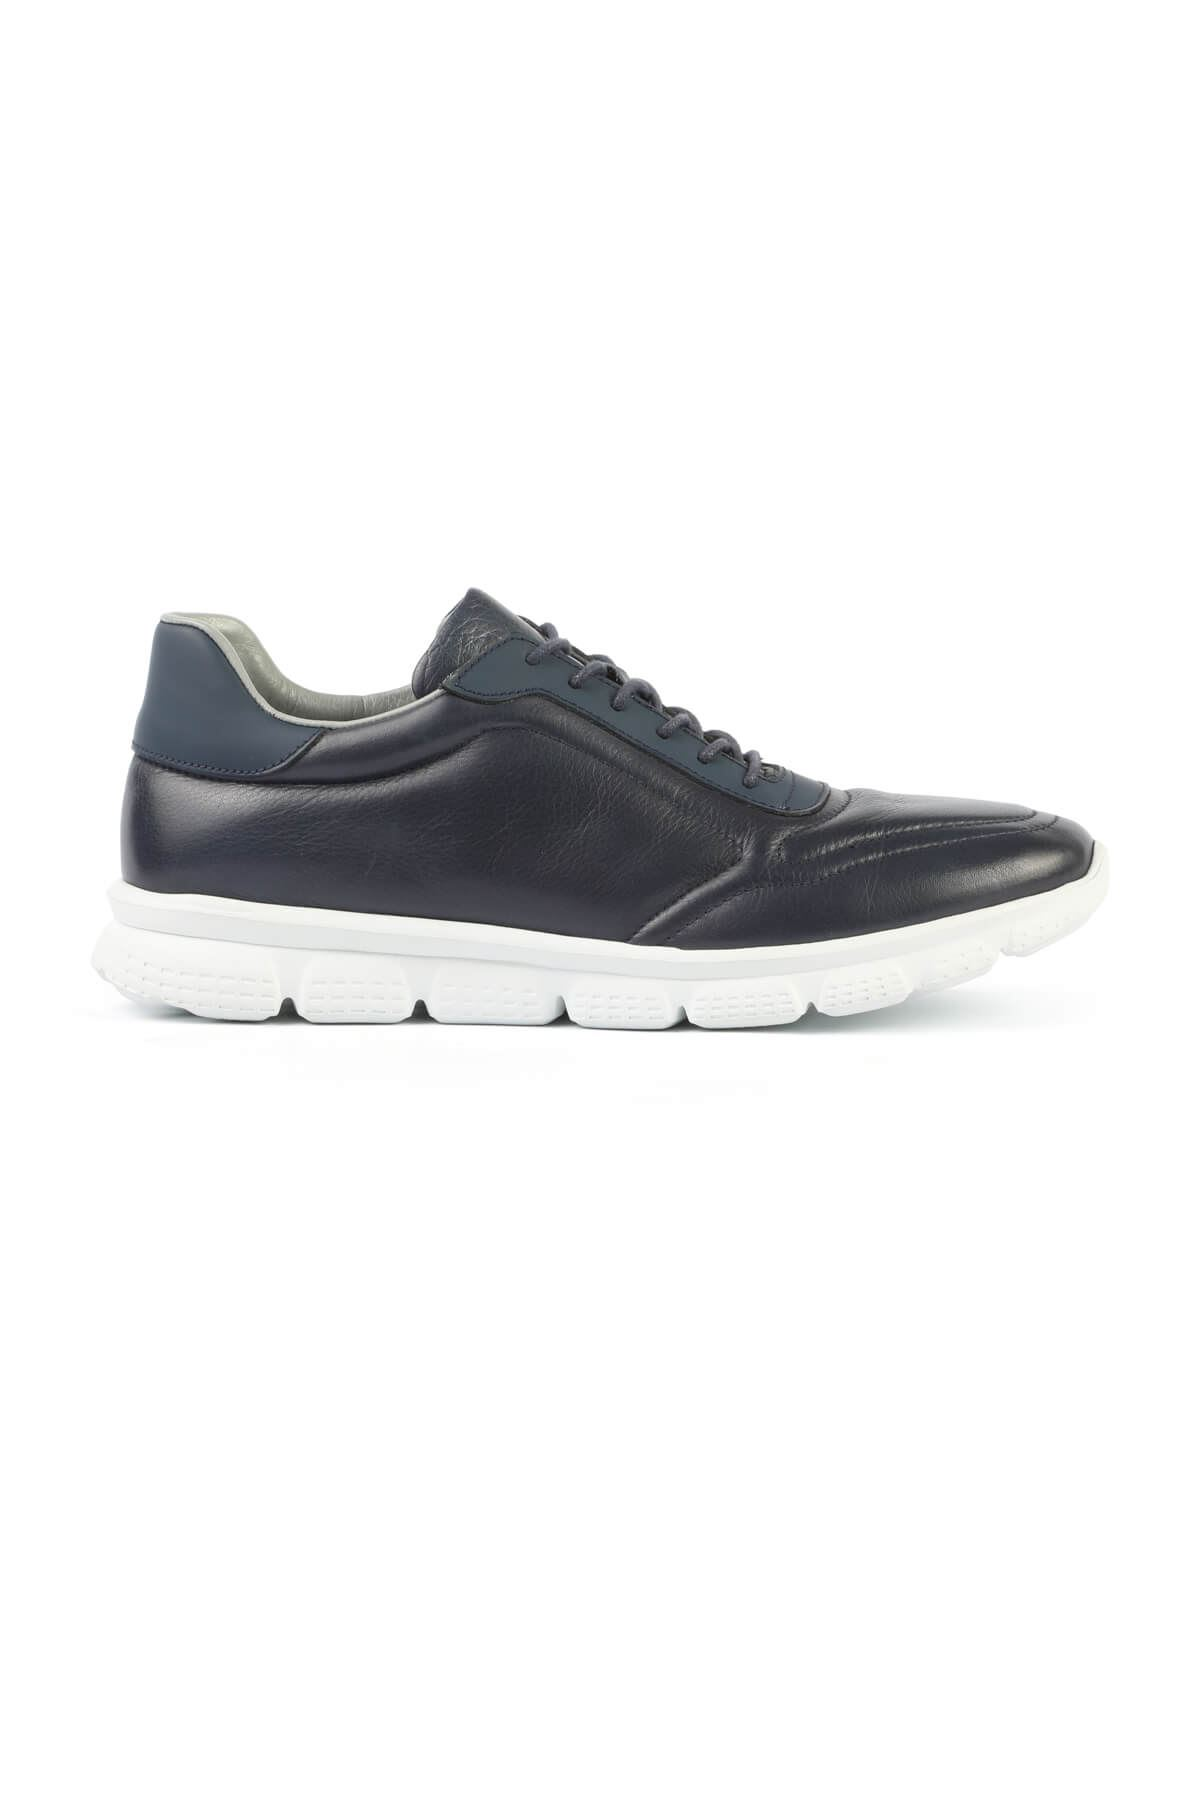 Libero 3121 Navy Blue White Sport Shoes